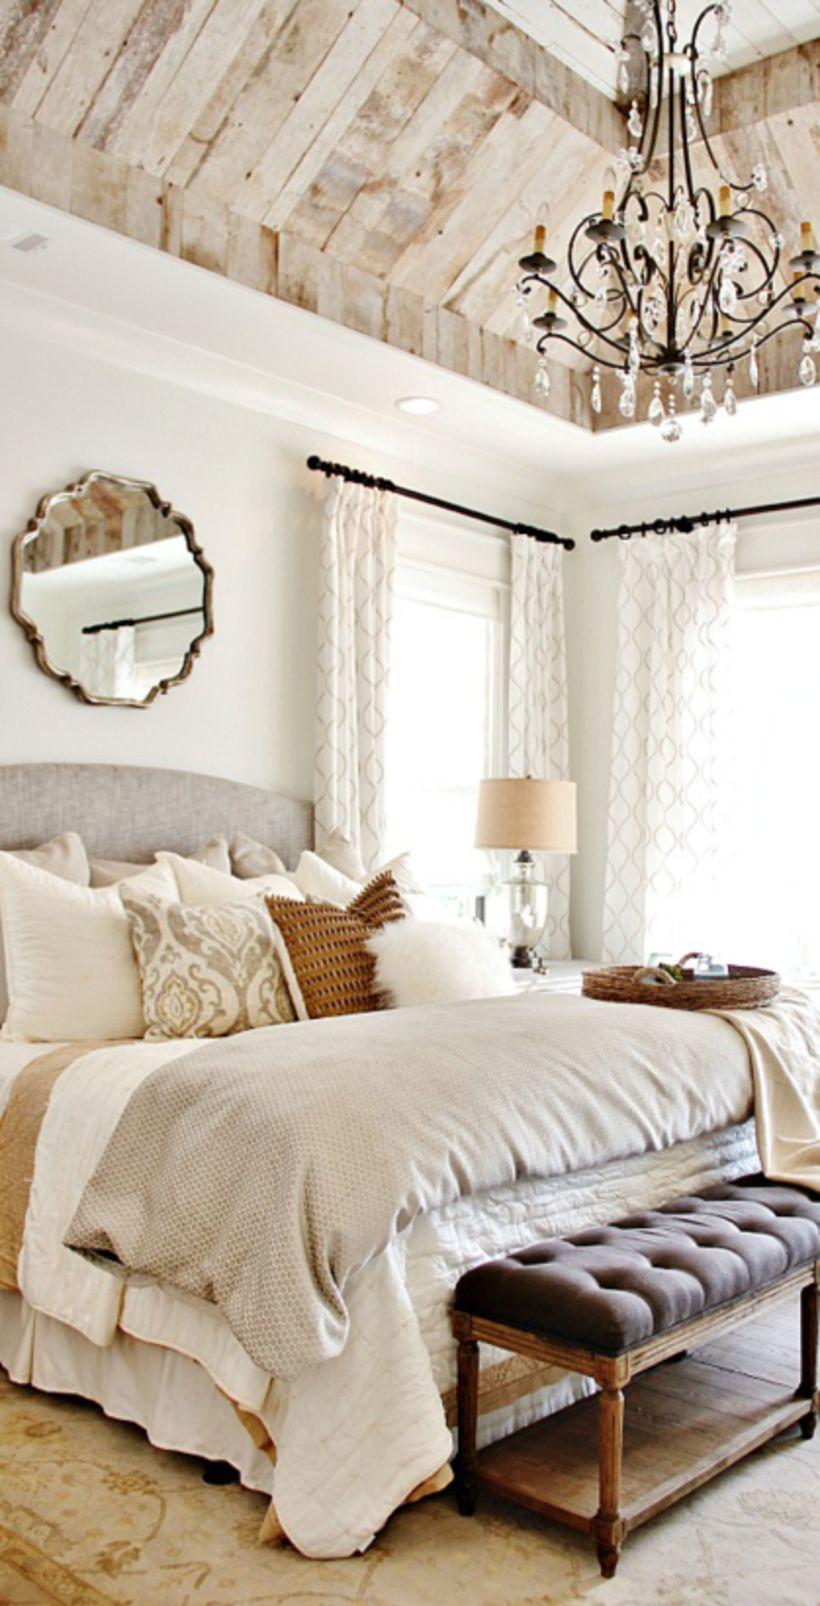 46 cozy white rustic bedroom decorating ideas farmhouse